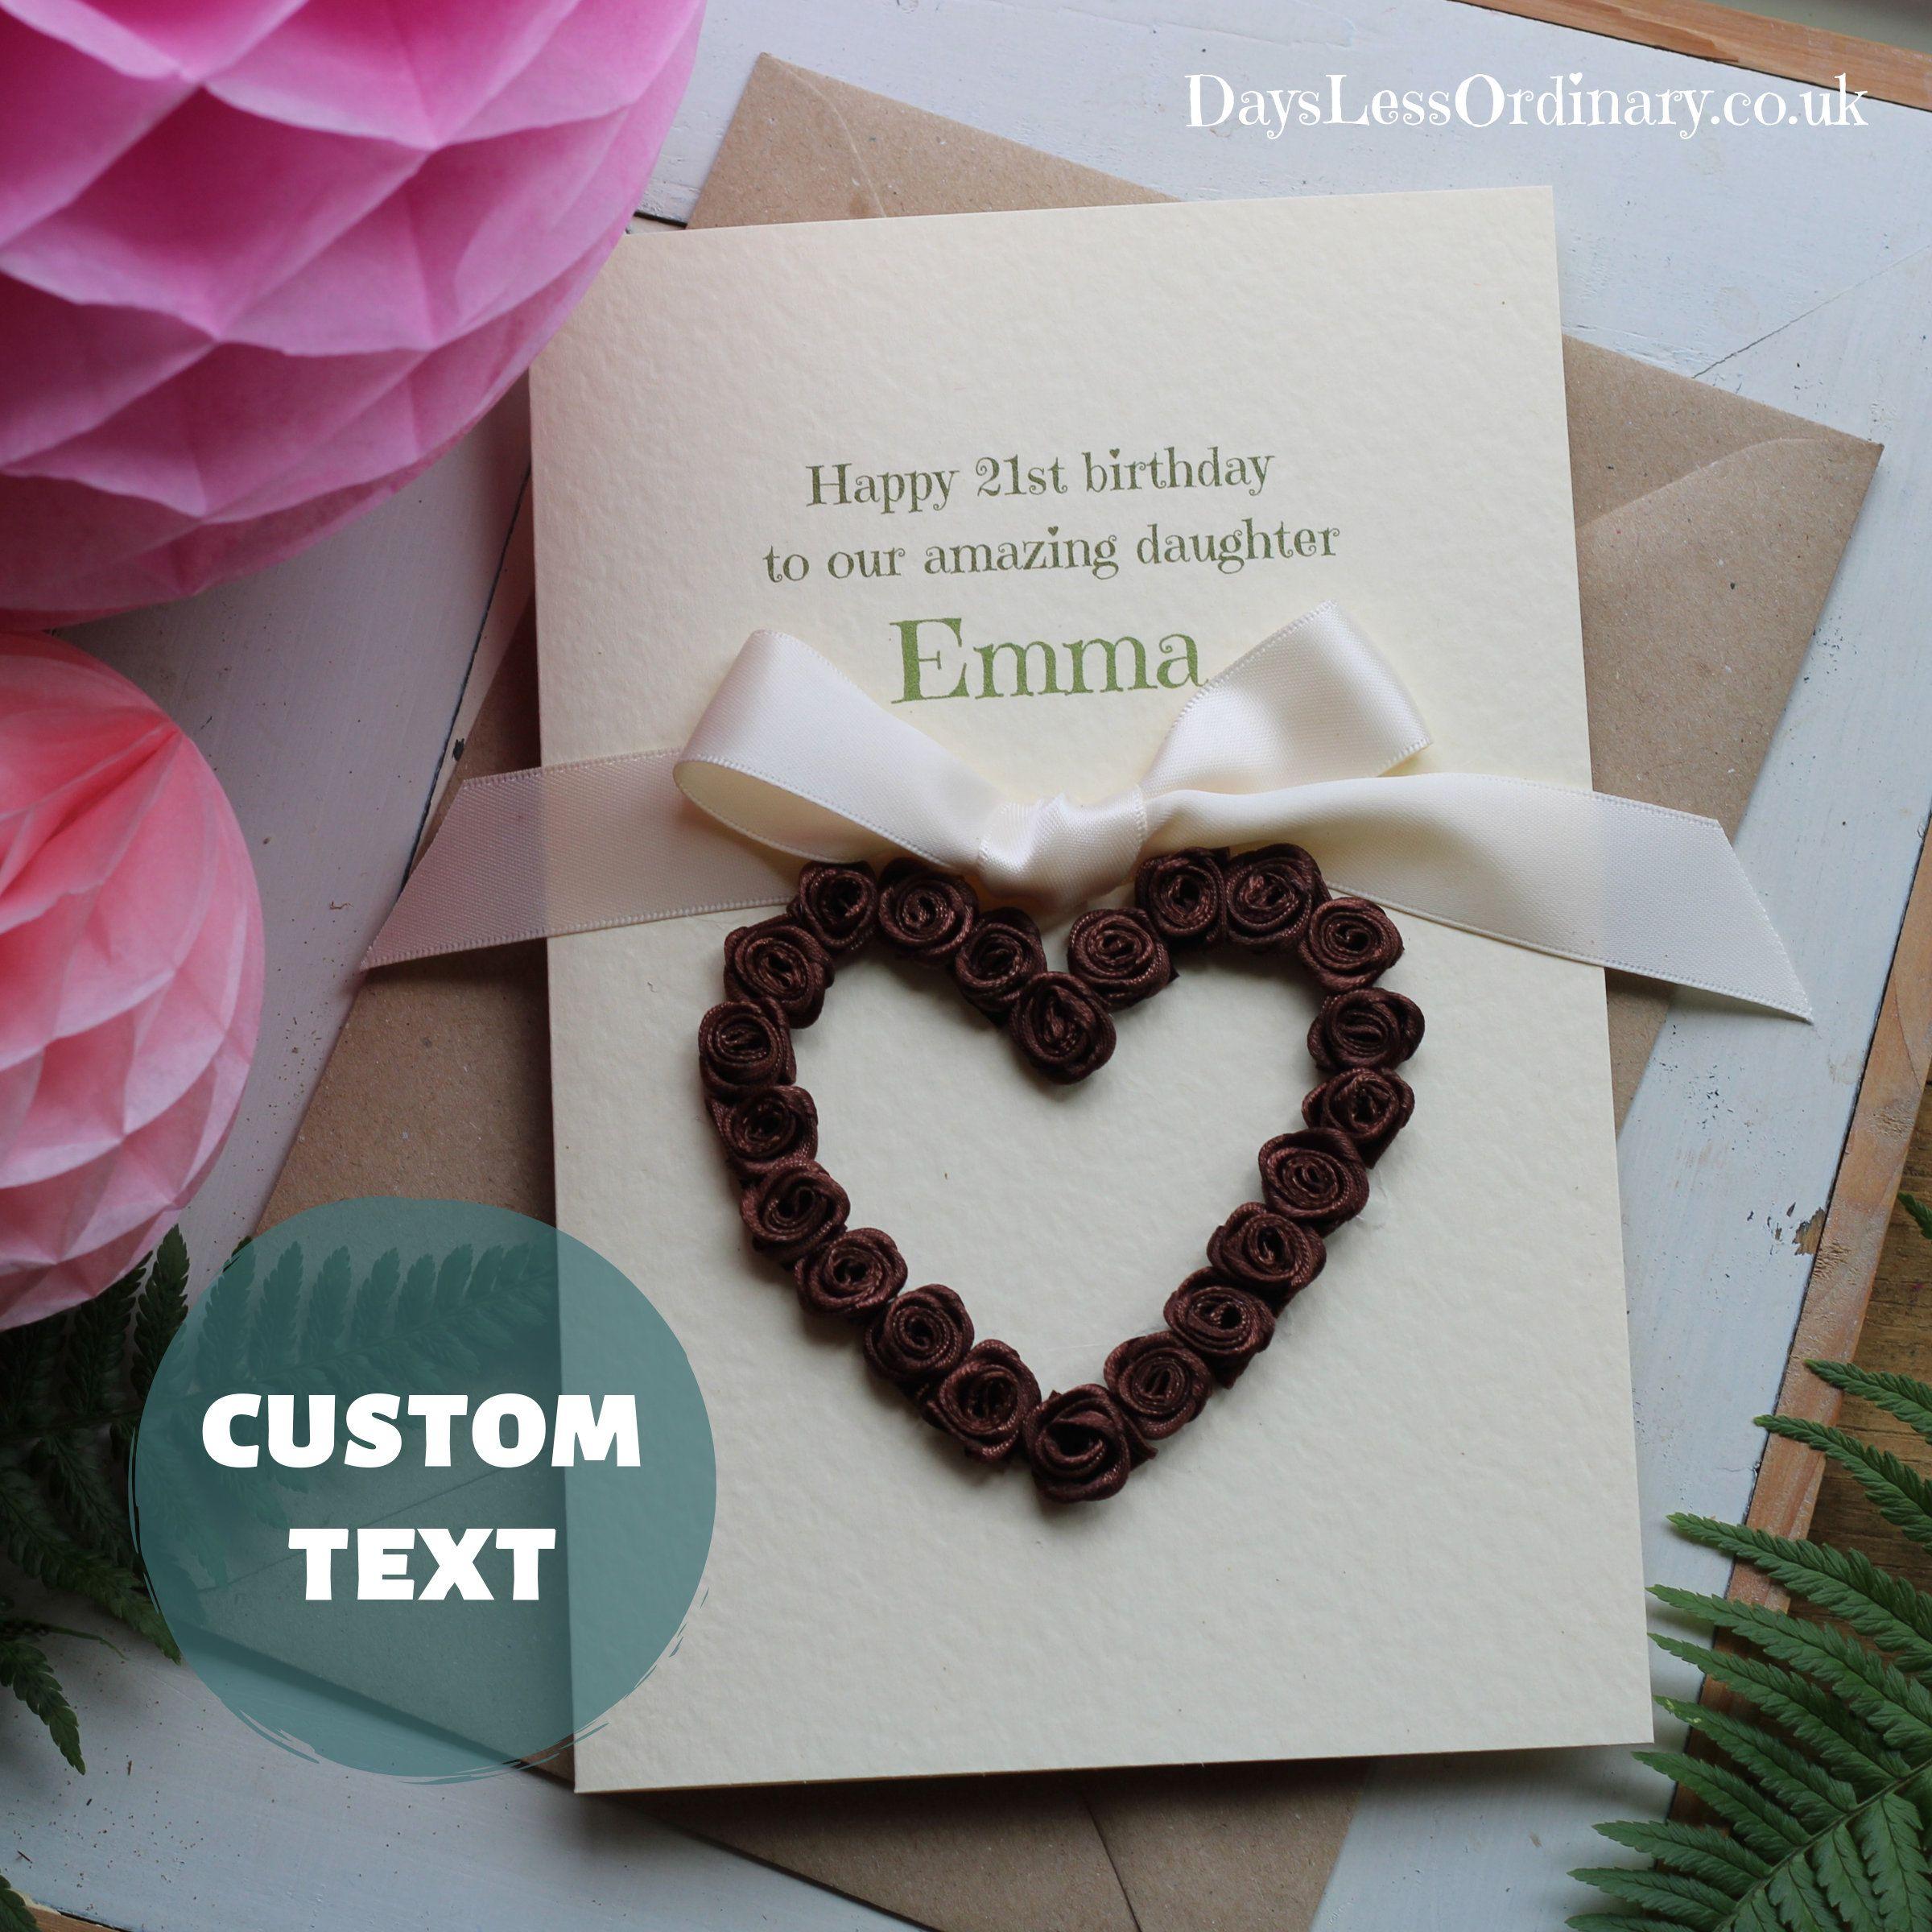 Custom Made Brown Roses Heart Handmade 50th Birthday Card 51st 52nd 53rd 54th 55th 56th Speci 70th Birthday Card Birthday Cards For Women Birthday Cards